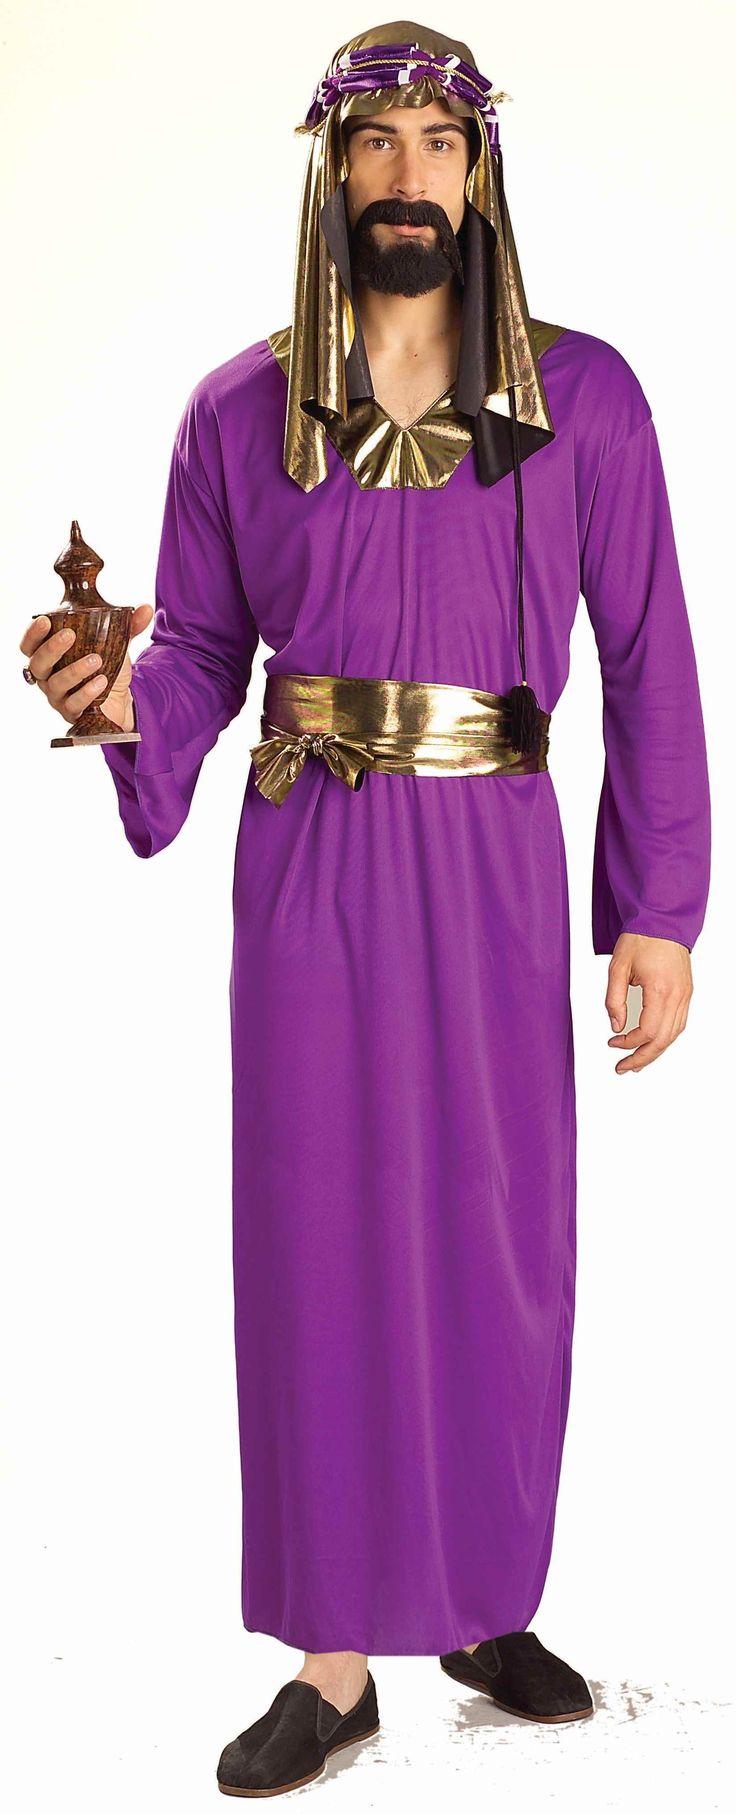 Best 10+ Wise man costume ideas on Pinterest | Nativity costumes ...